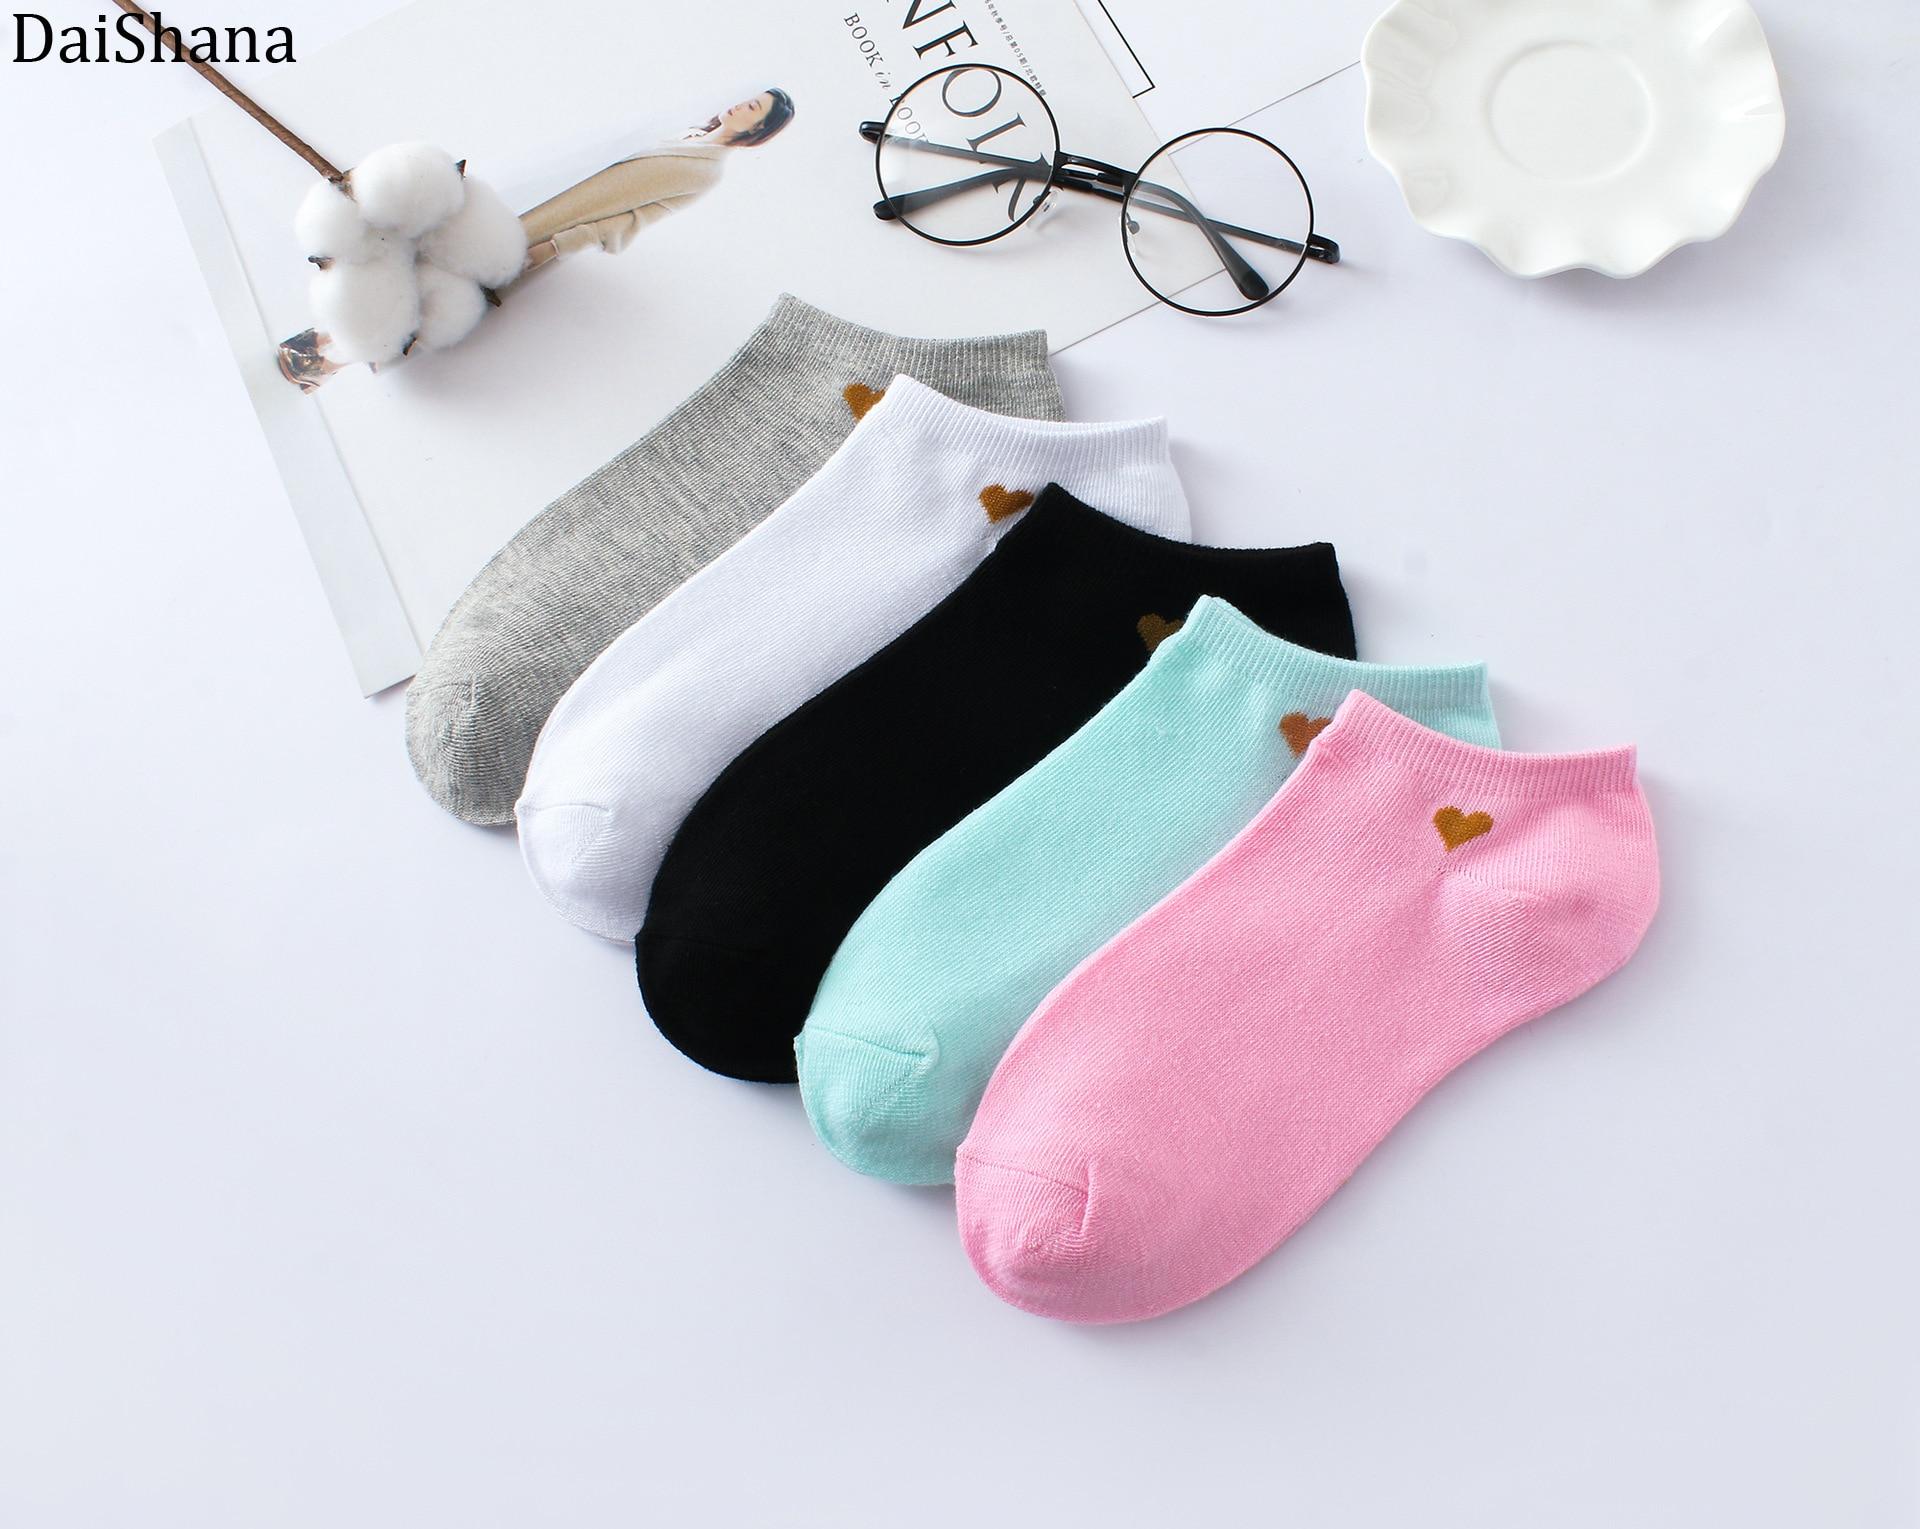 1 Pair Spring New Arrivl Women Socks Kawaii Fashion Girls Ankle Funny Cotton Socks Casual Candy Colors Breathable Sock Skarpetki